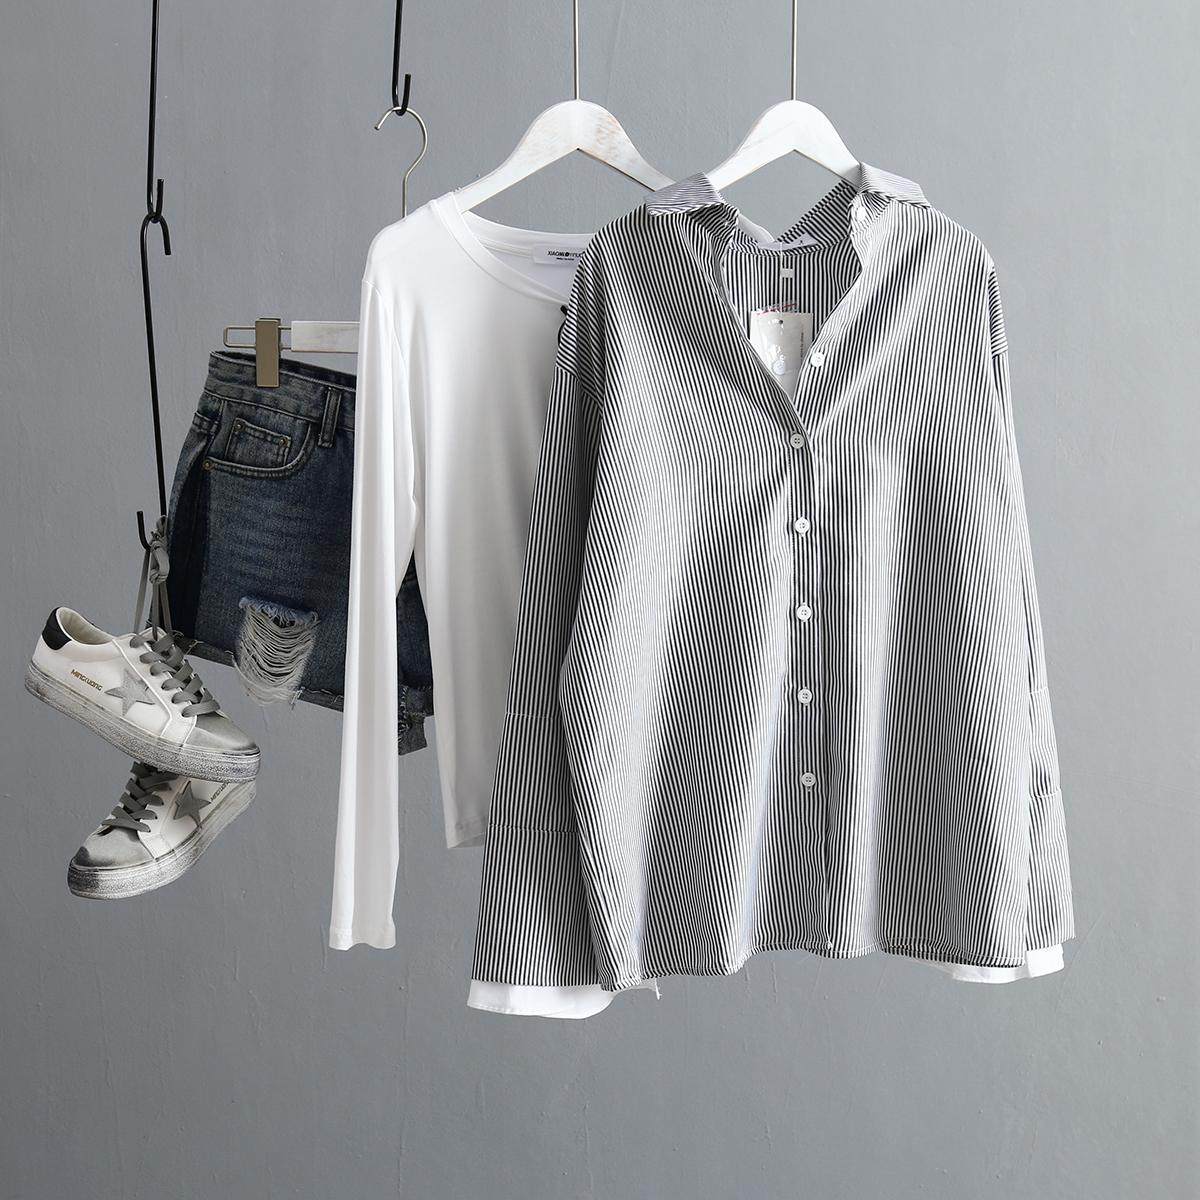 Korean Fashion Black Striped Shirt Women Double Flare Sleeve Vintage Shirt Spring Autumn Ladies Oversized Blouse Chemise Femme